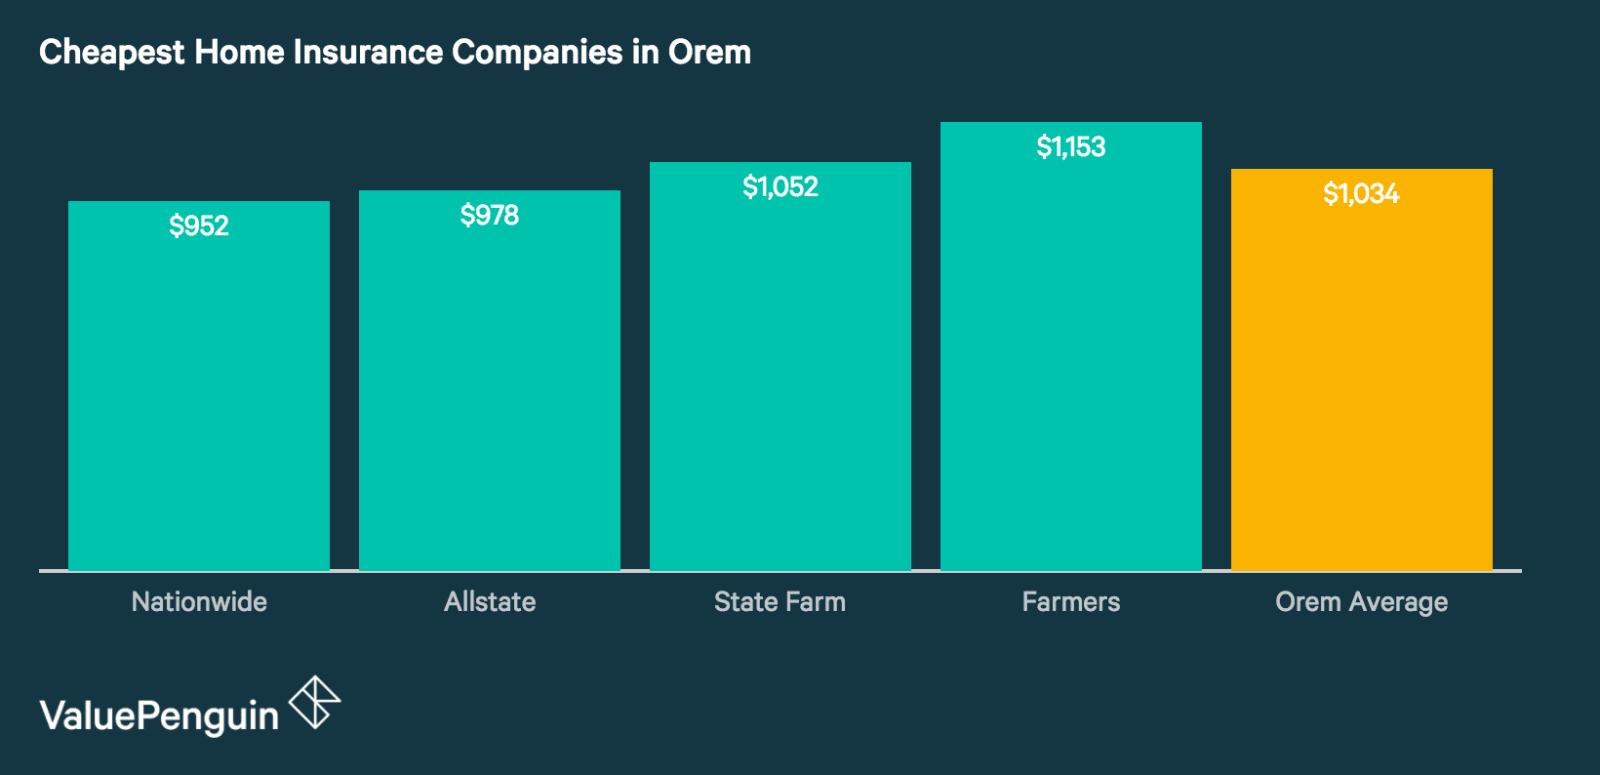 Best Cheap Home Insurance Companies in Orem